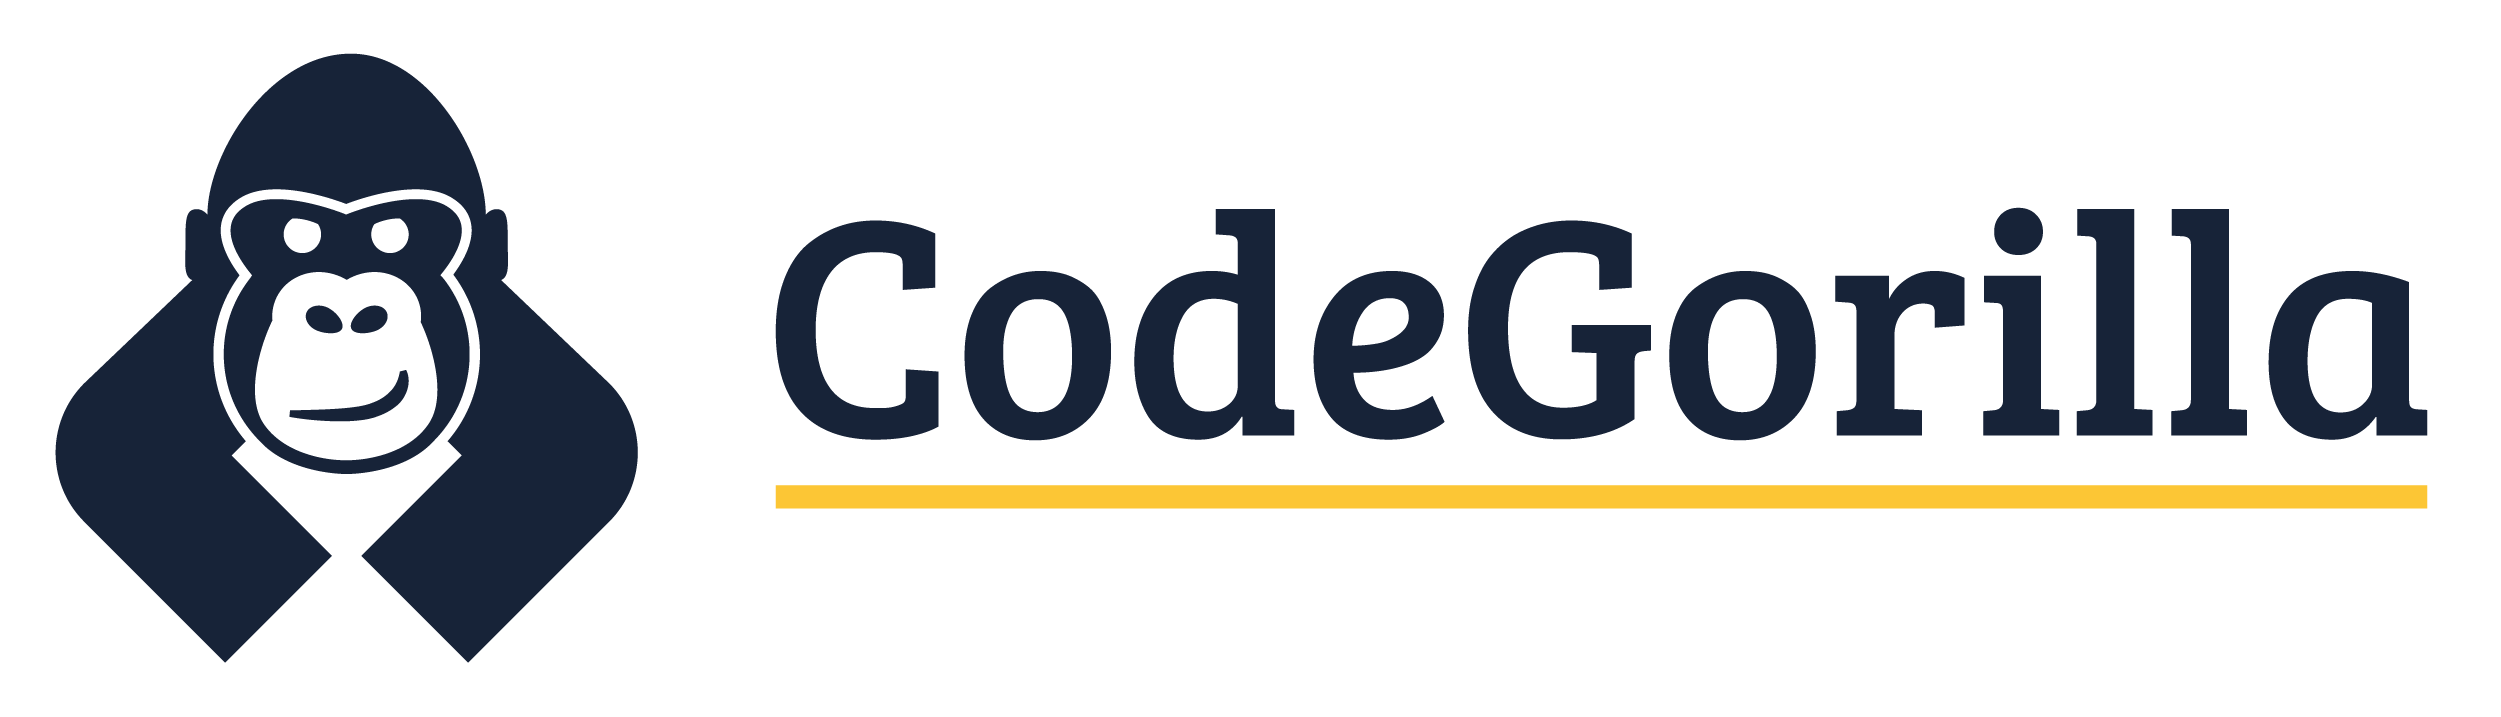 CodeGorilla logo